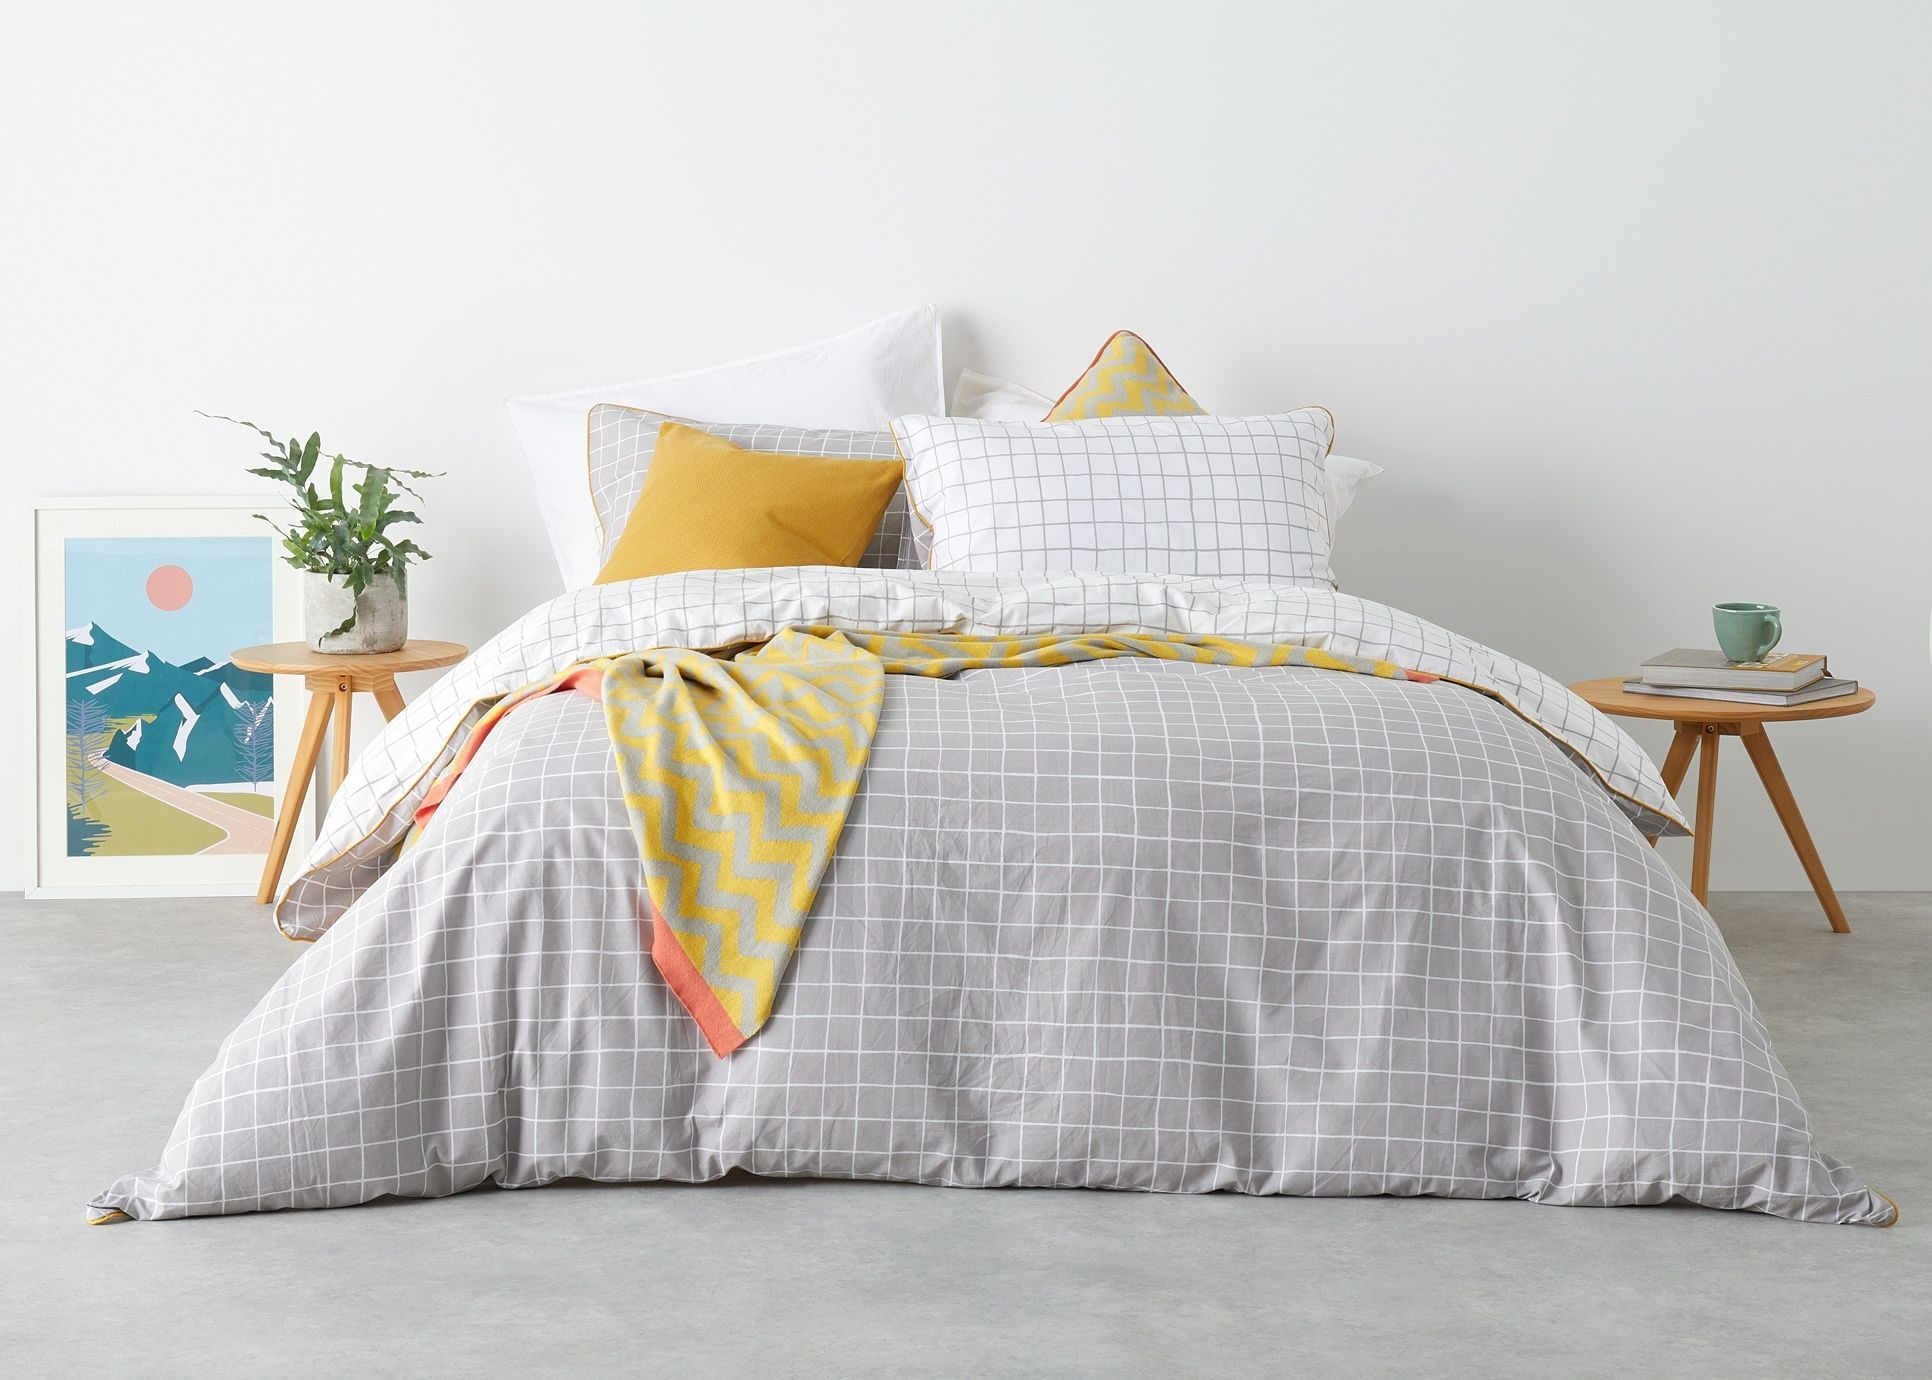 Ludo King 100 Cotton 200 T C Bed Set Grey White Uk From Made Com Express Delivery Grid Bedding Bedding Sets Cotton Duvet Cover Affordable Bedding Sets